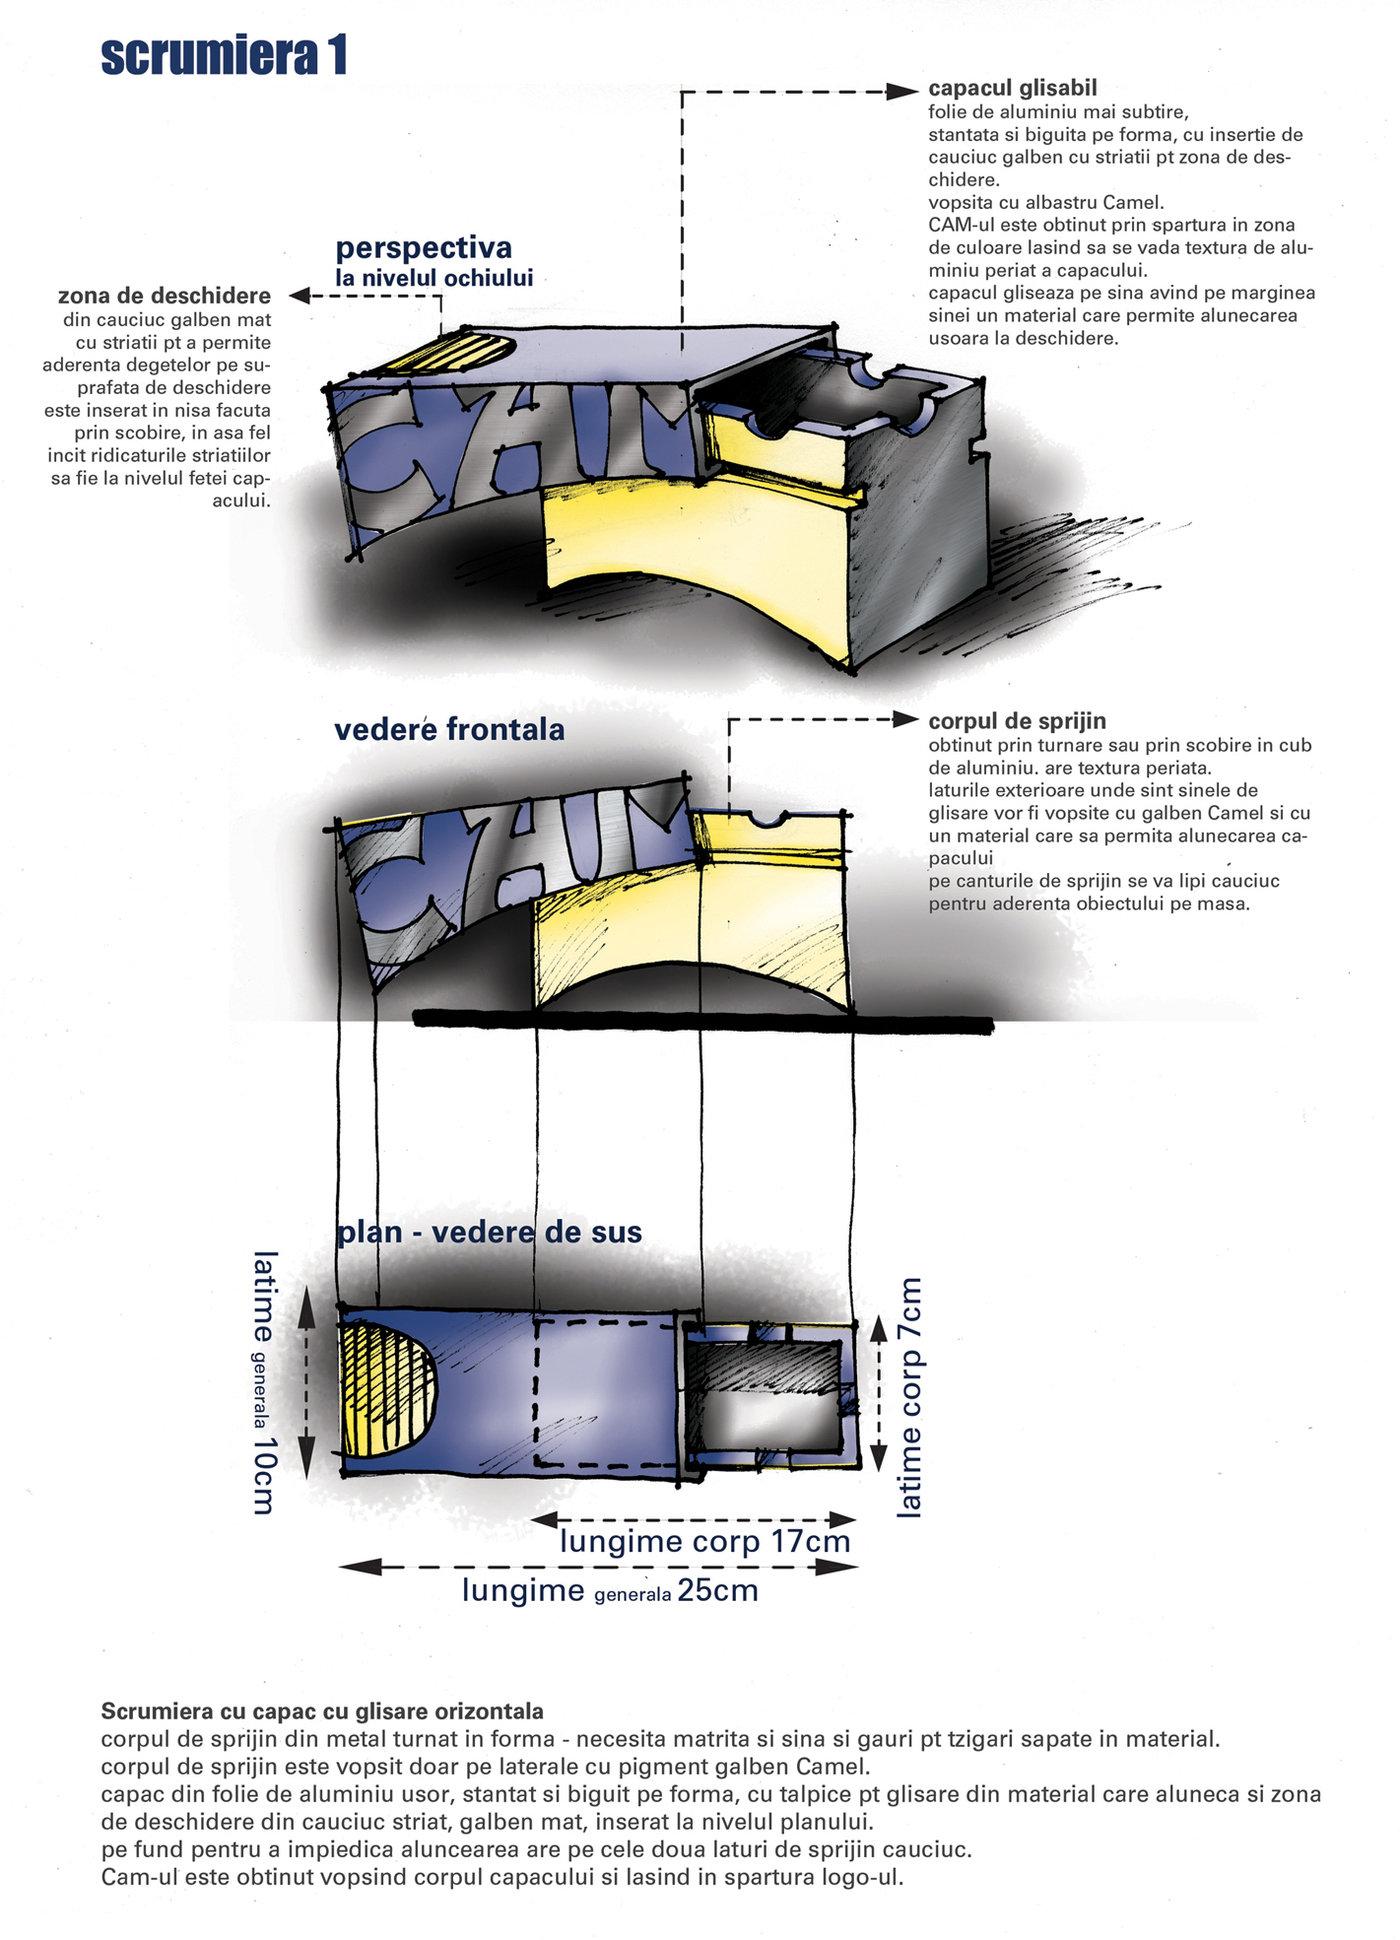 lenjerie de corp de compresie din varicosera ortho